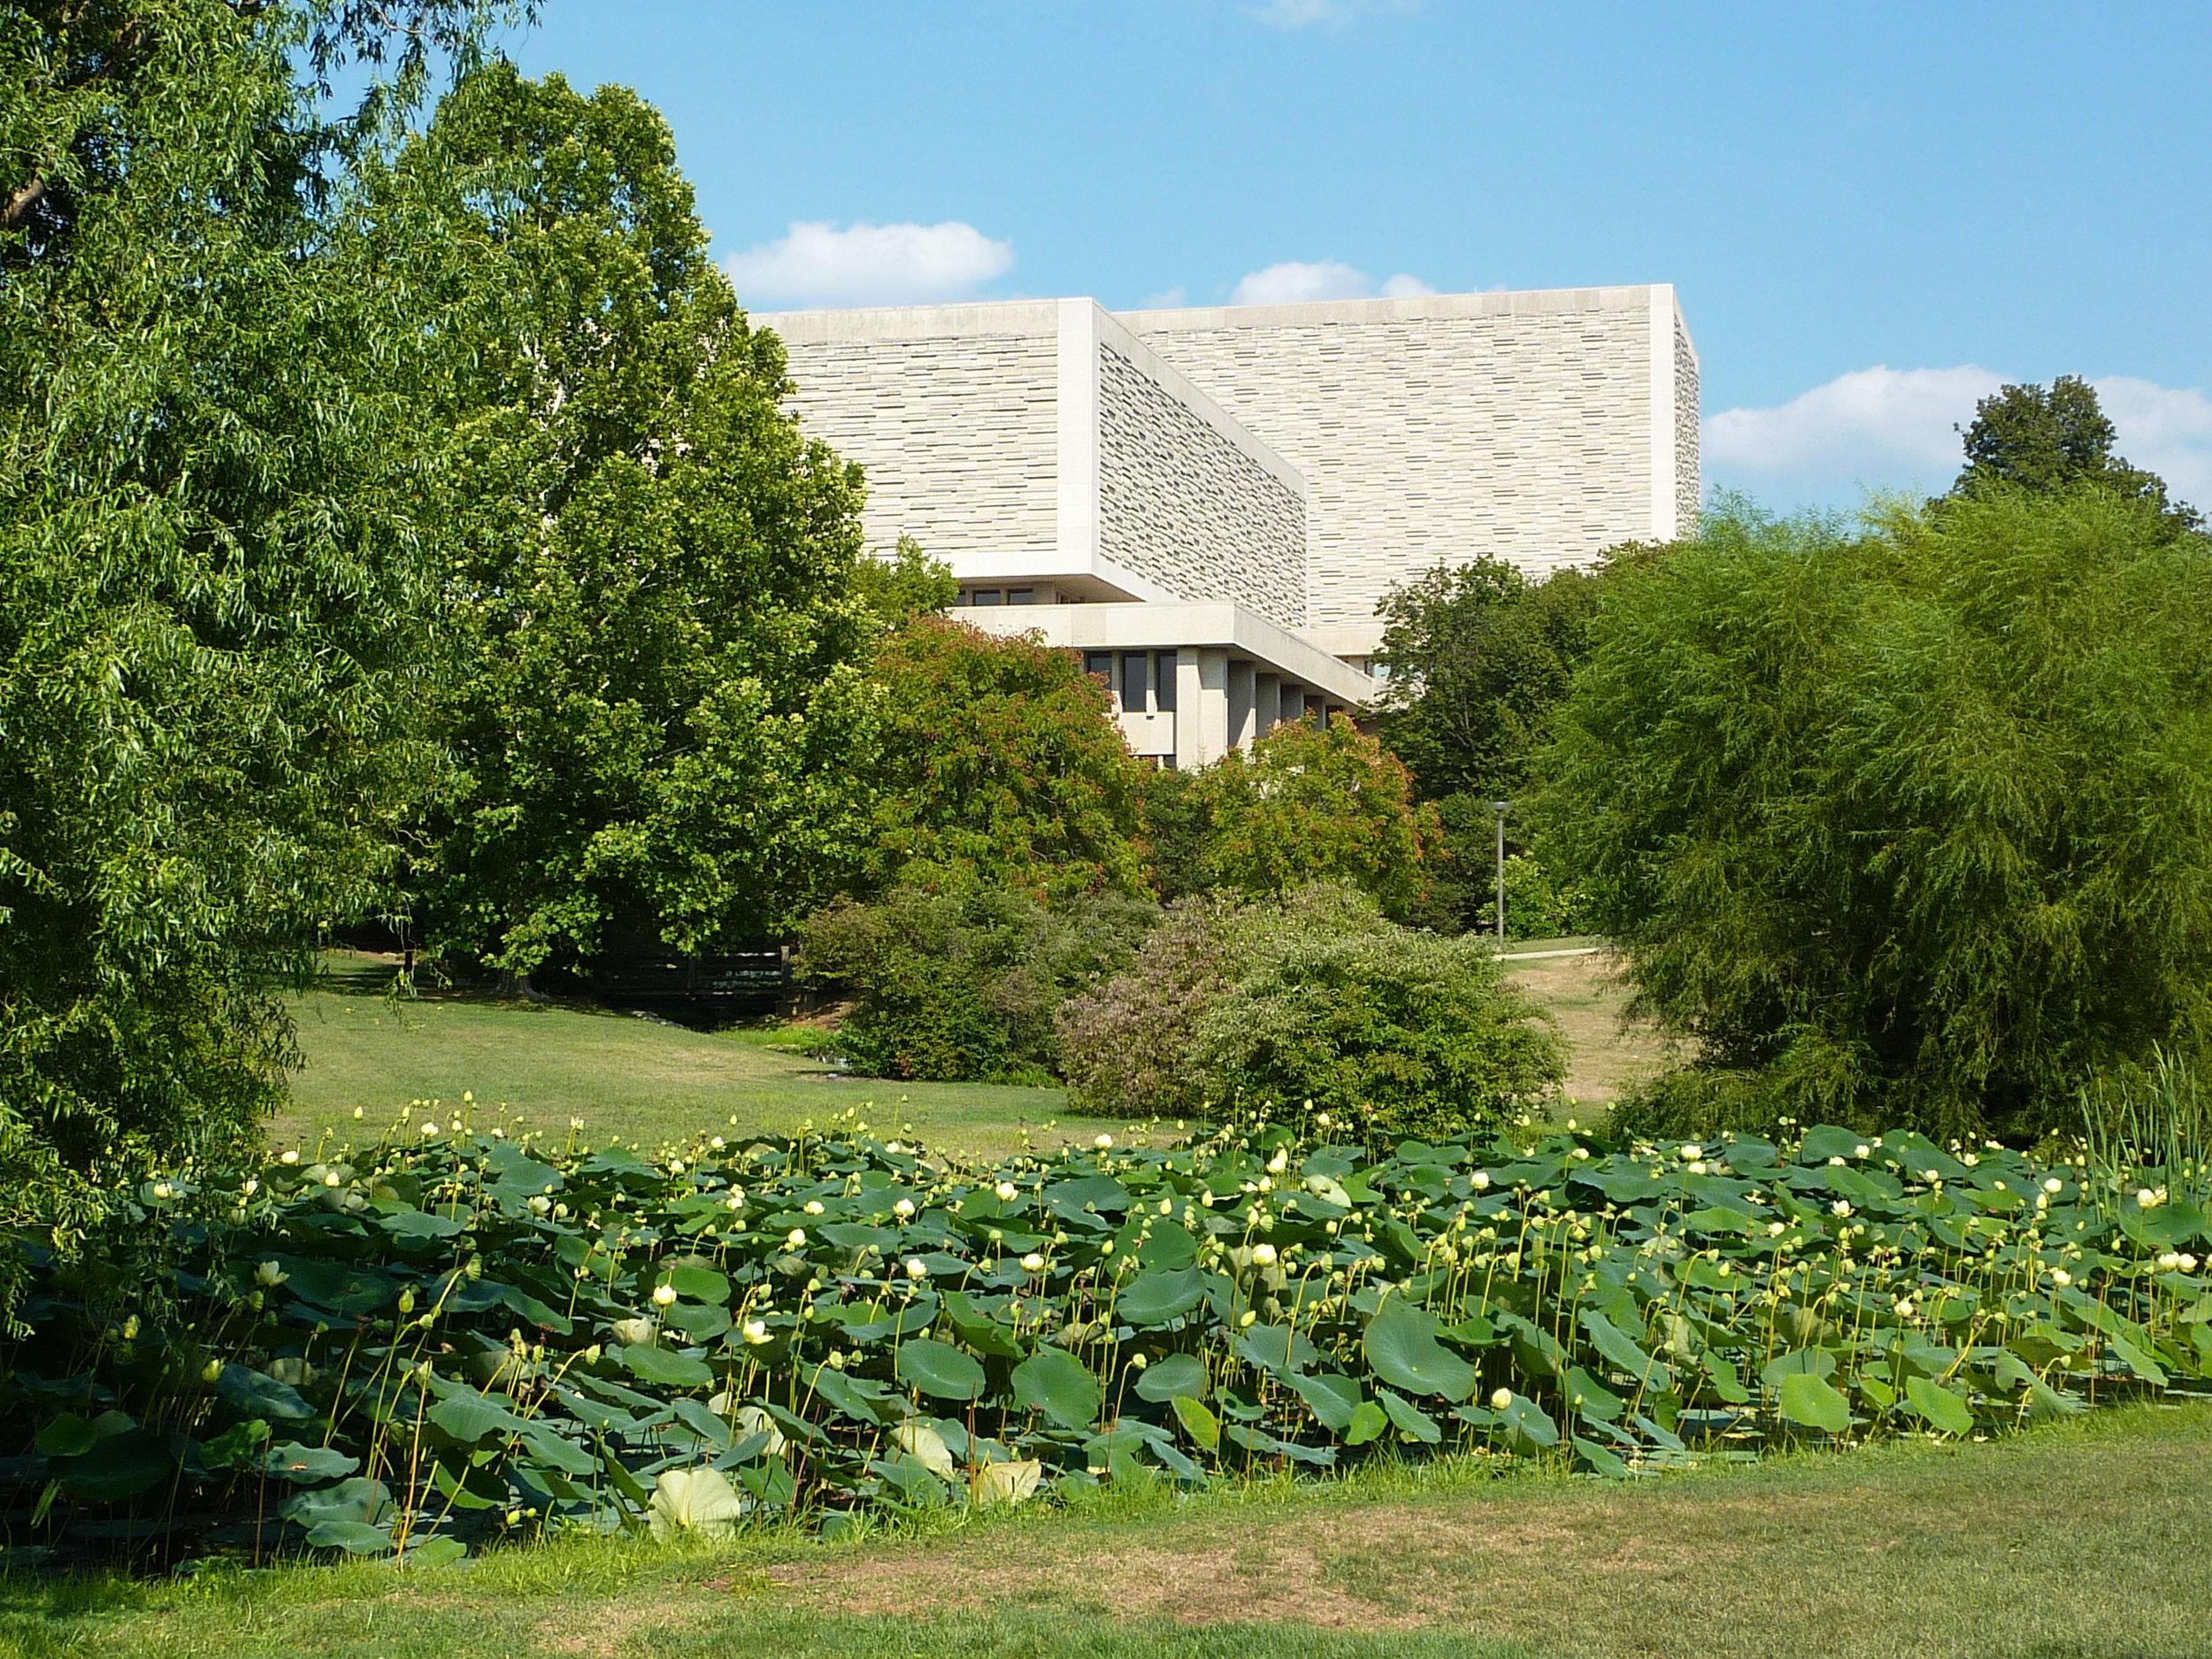 Herman B Wells Library | Picture by  Vmenkov